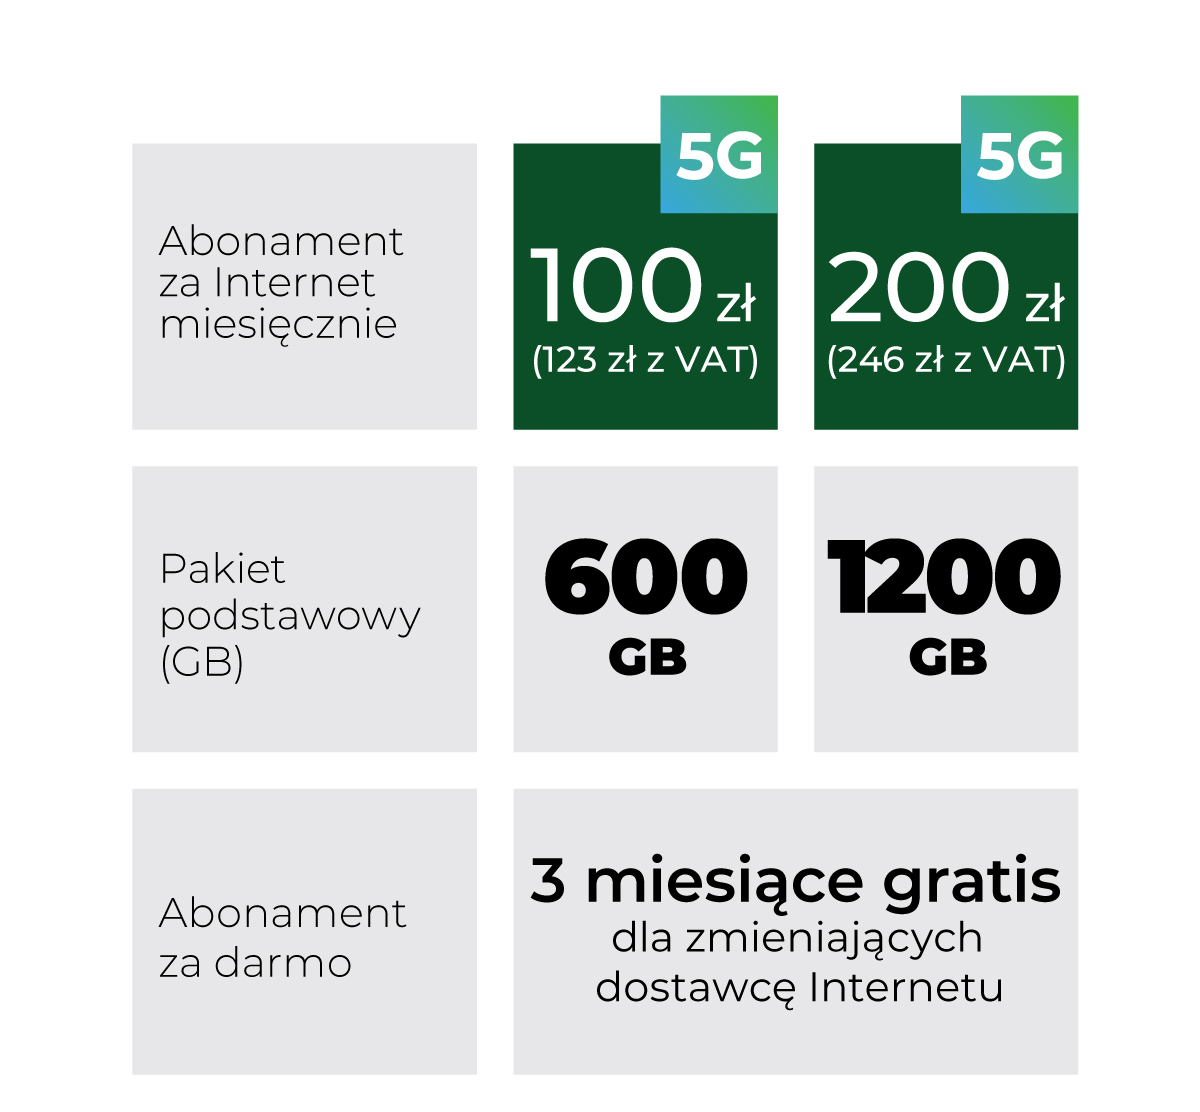 Plus internet 5G nowa oferta cennik 2021 biznes